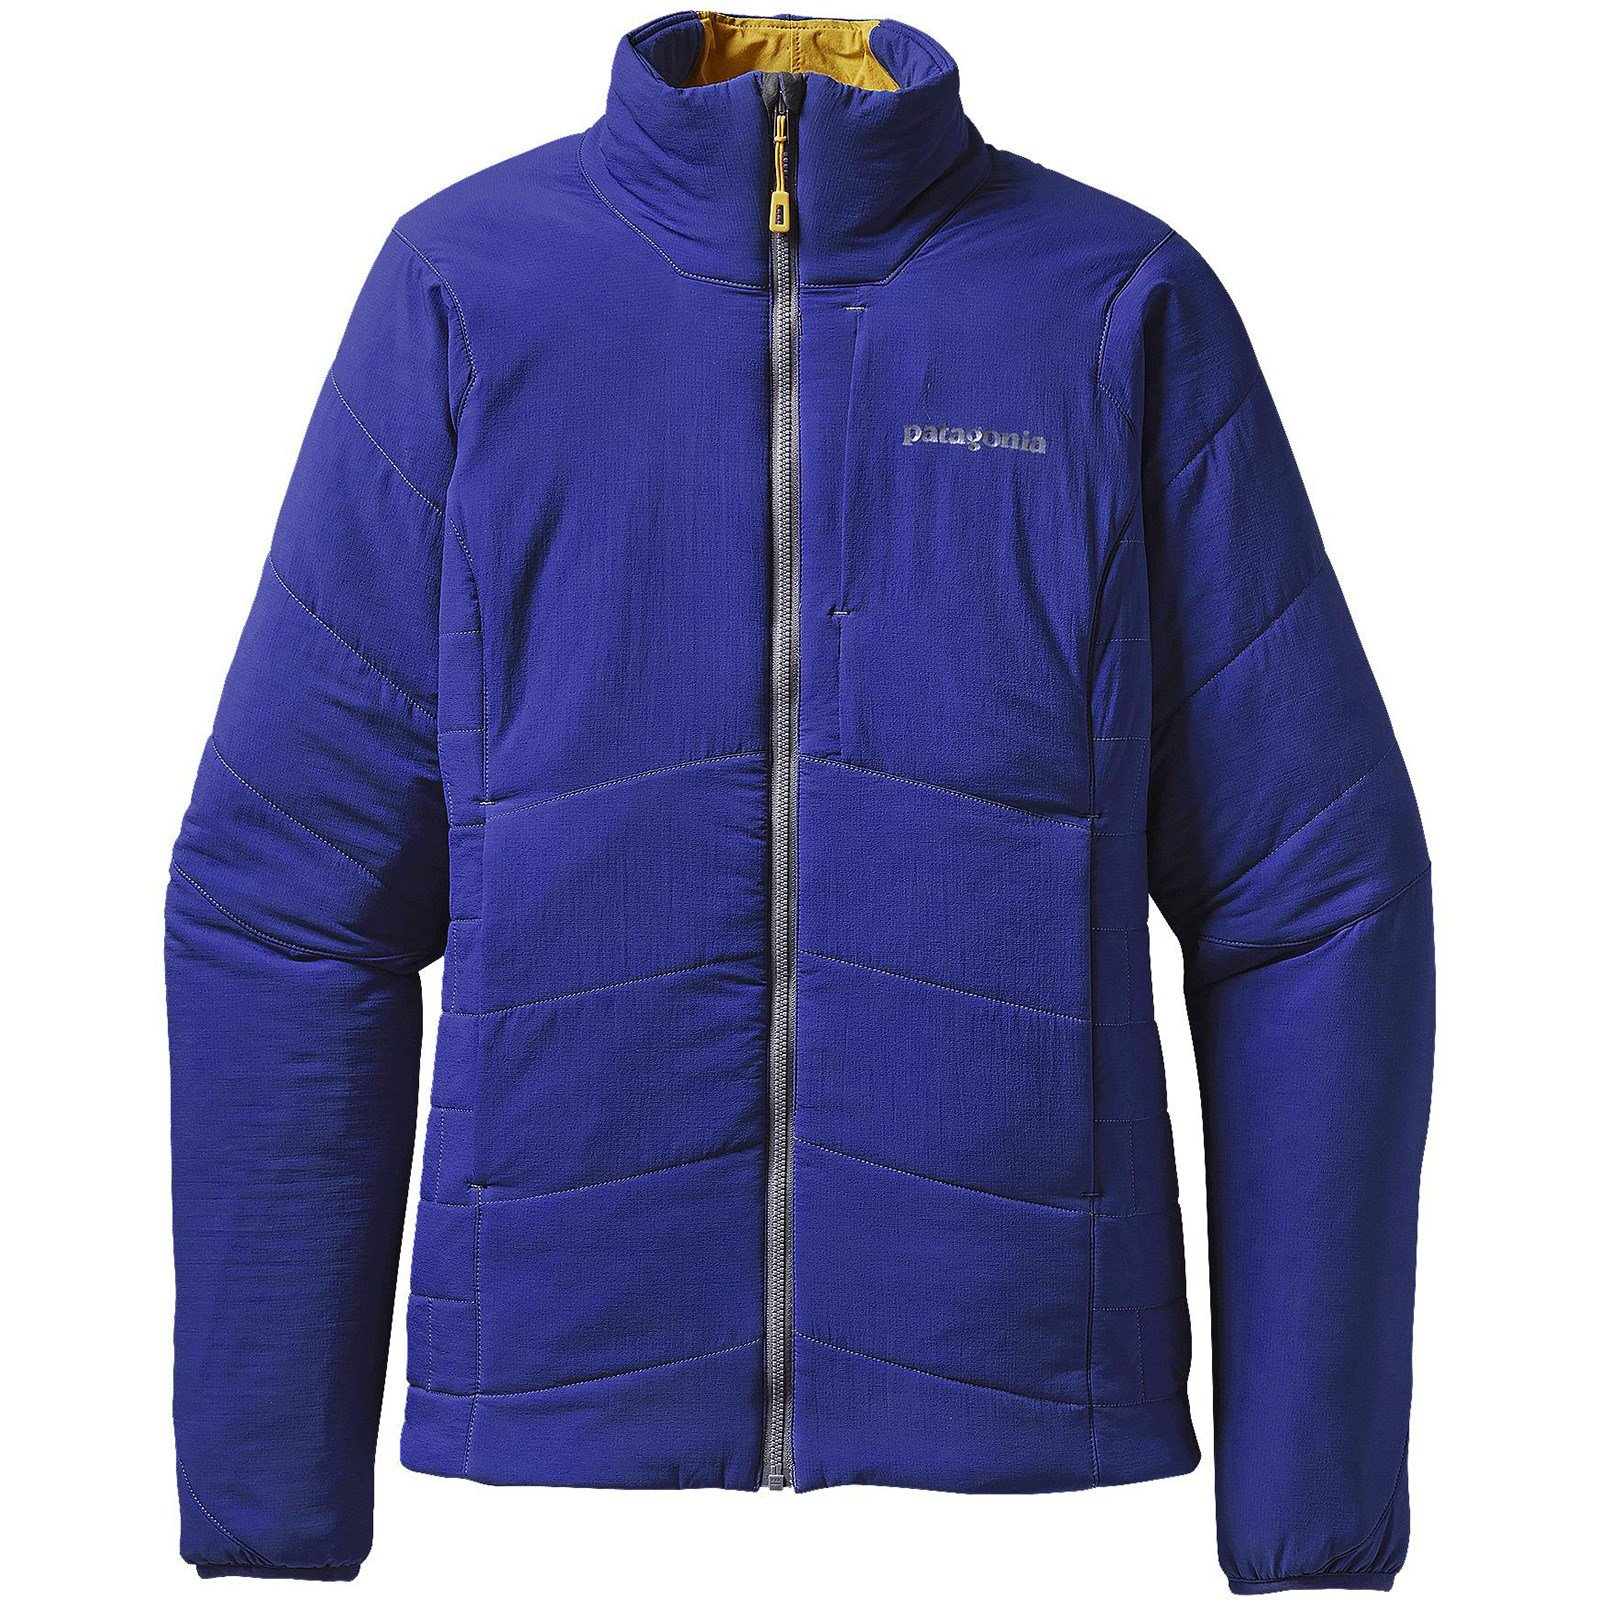 Patagonia W's Nano-Air Jacket